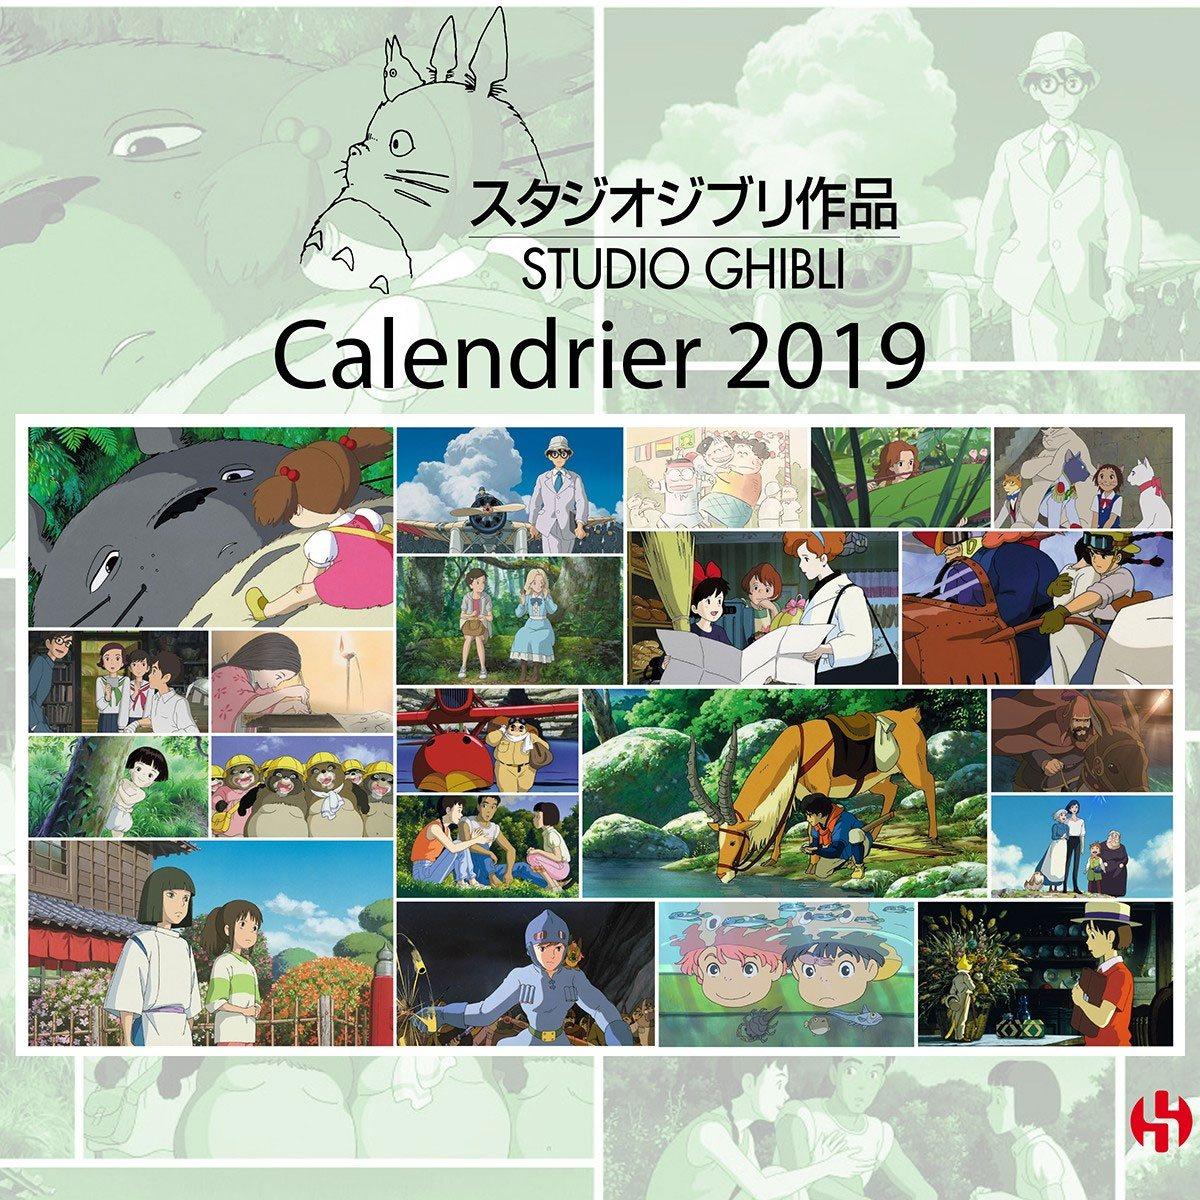 Studio Ghibli Calendar 2019 French Version*